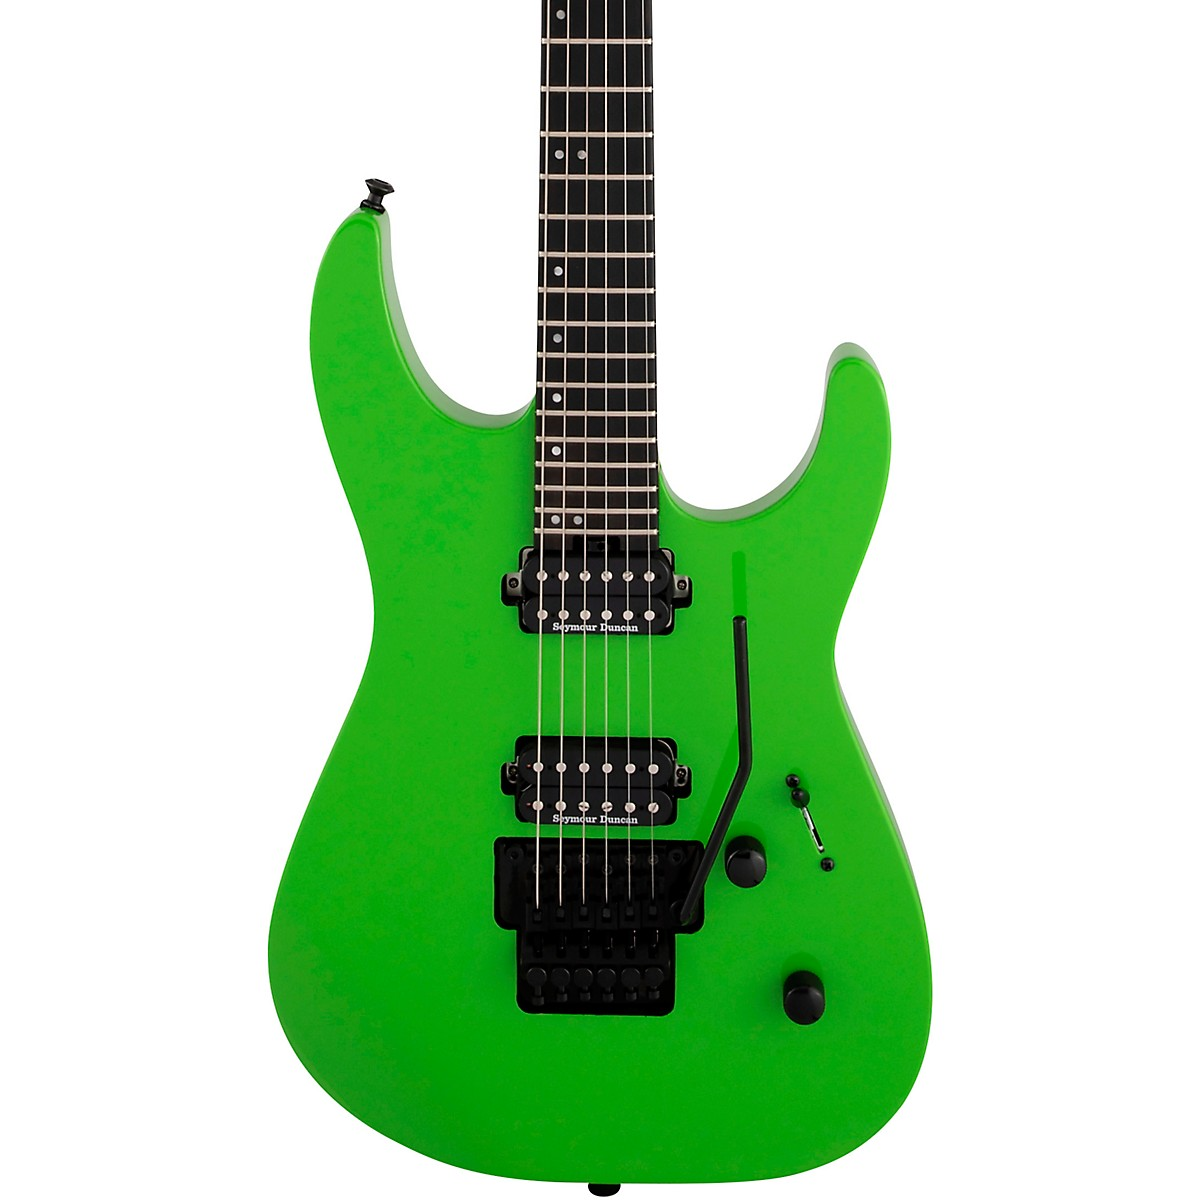 Jackson Pro Series Dinky DK2 Okoume Electric Guitar